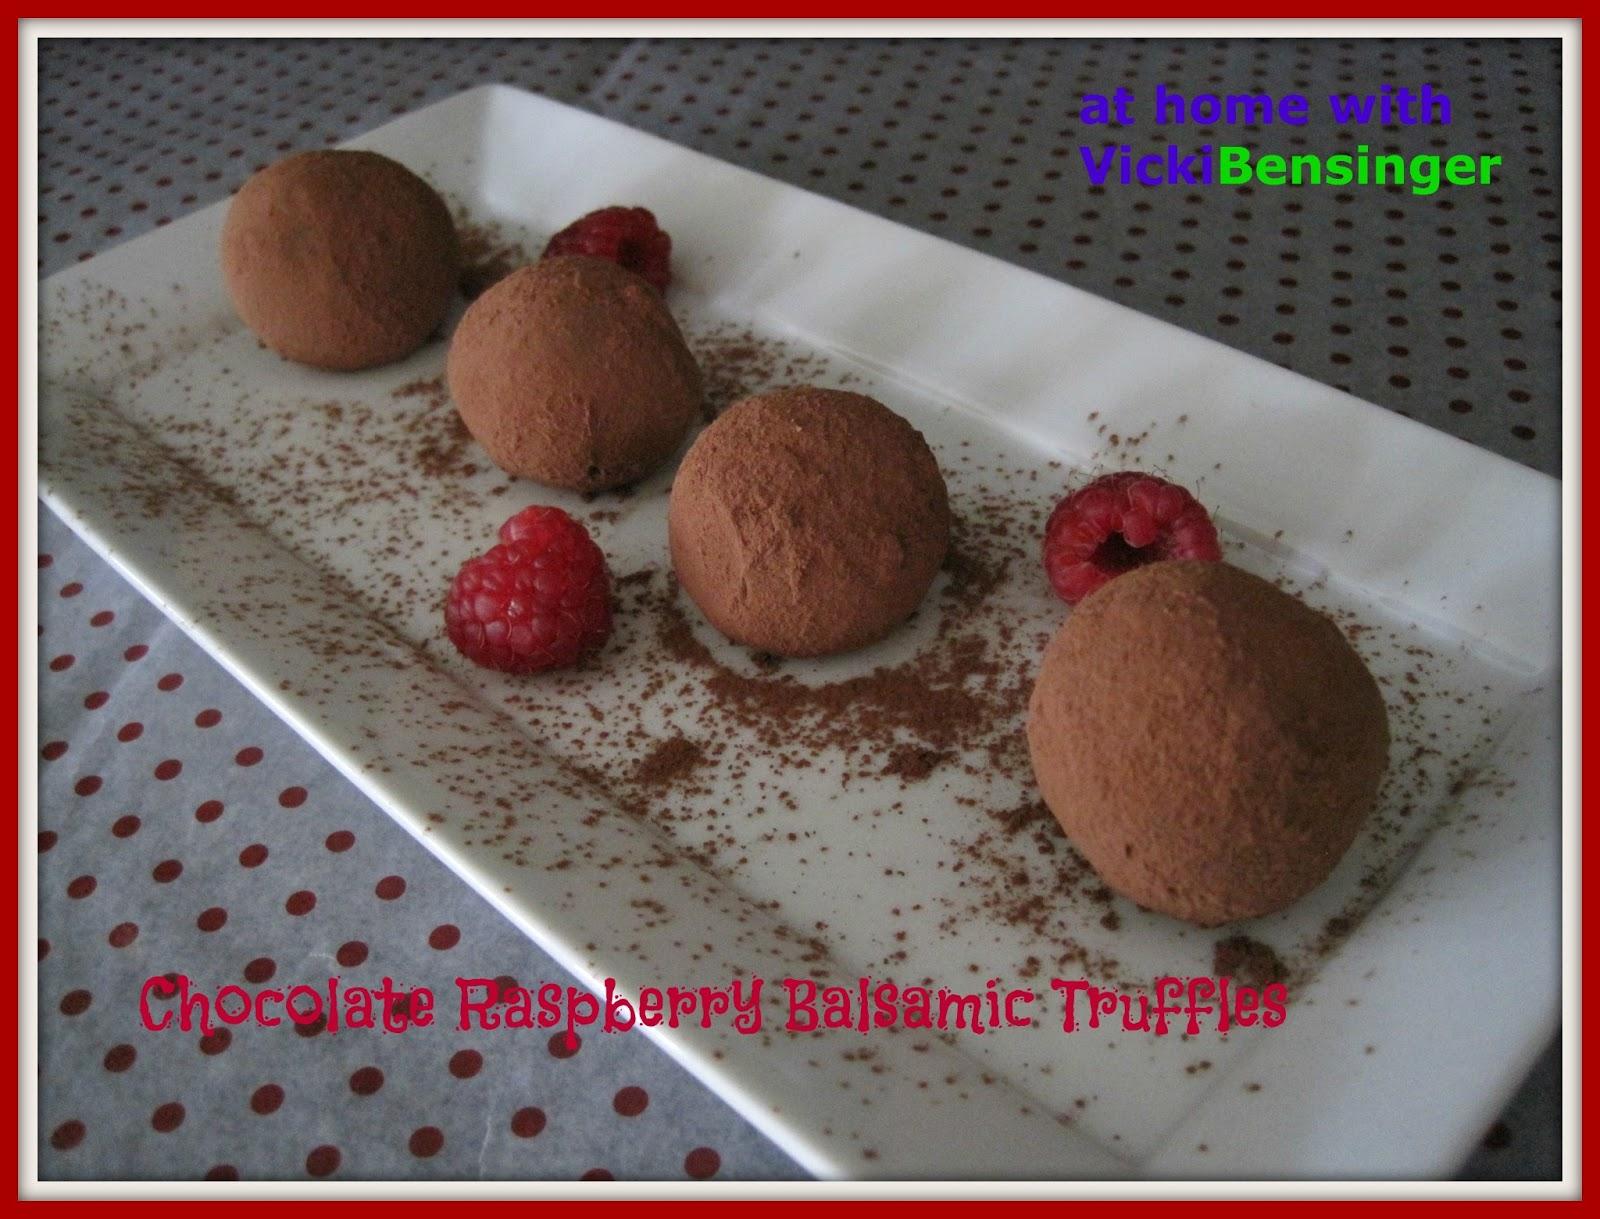 Chocolate Raspberry Balsamic Truffles – At Home with Vicki Bensinger